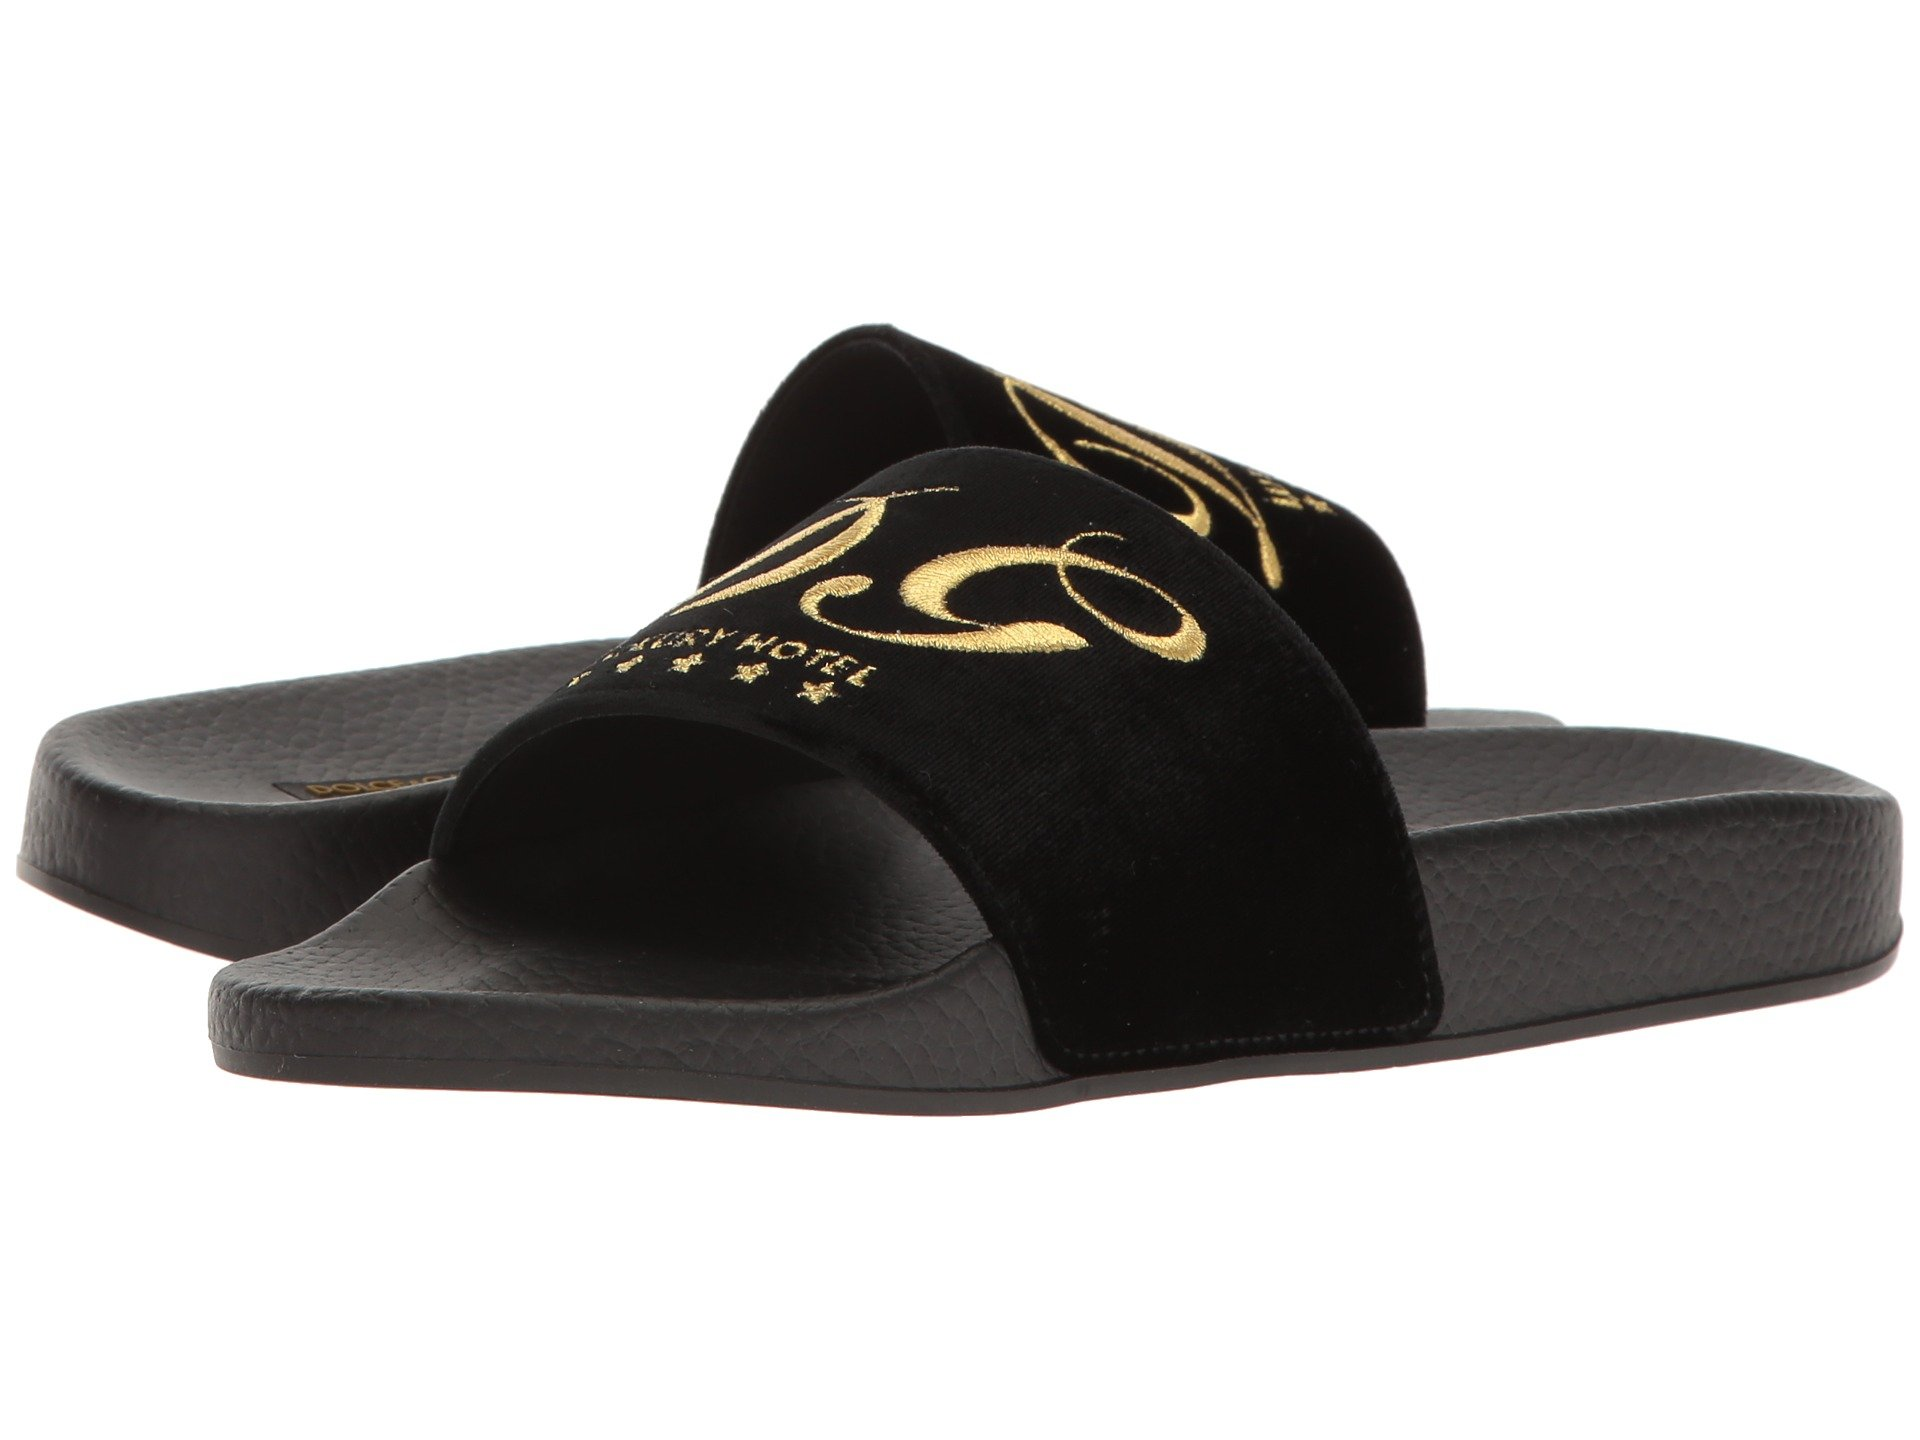 Dolce & Gabbana Rubberized Leather DG Pool Slide R2qteOumBR